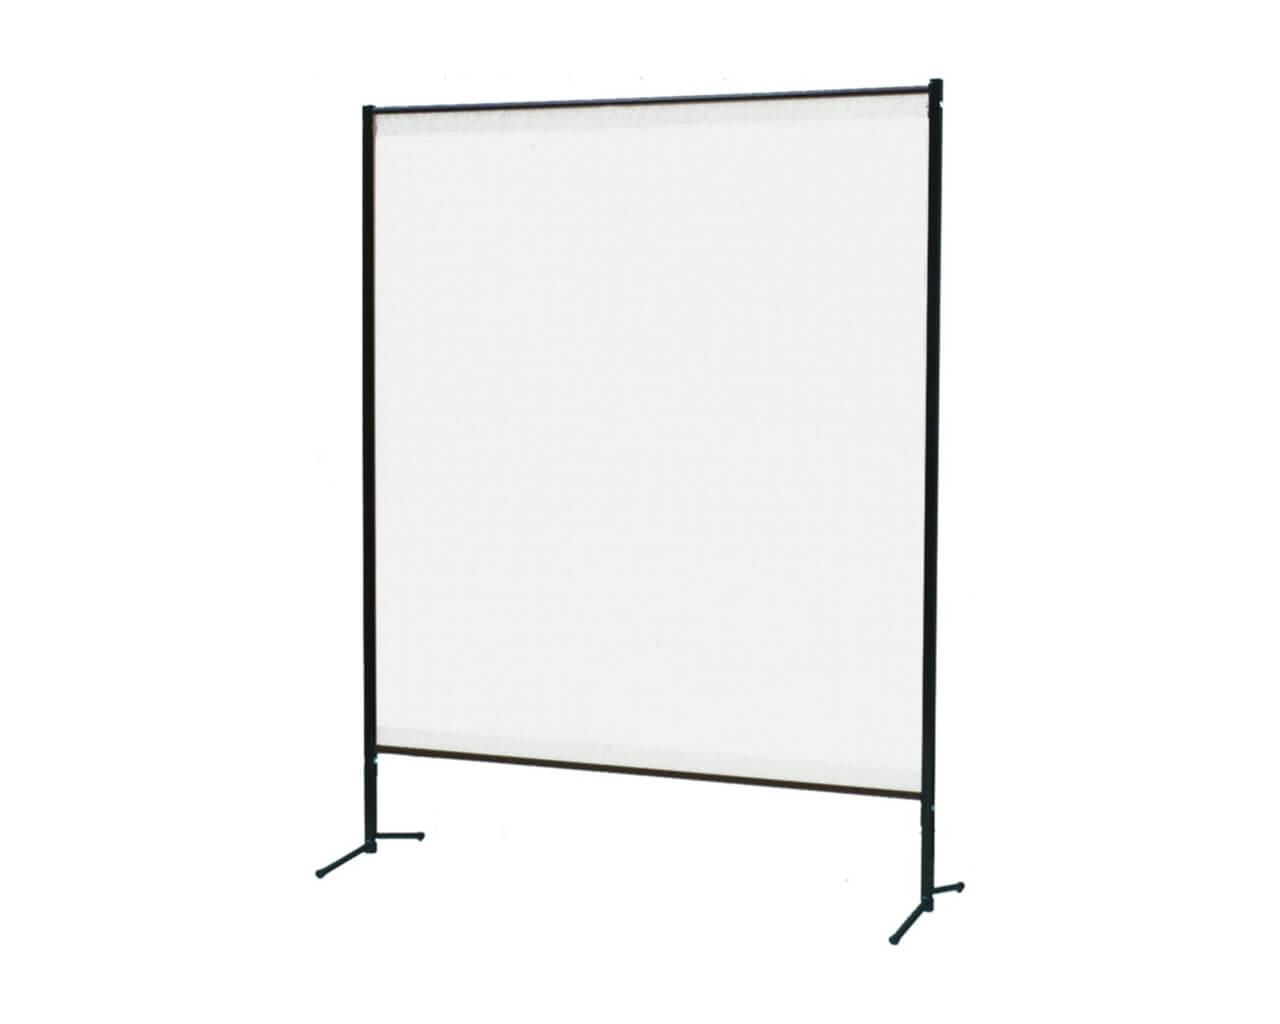 Schutzwand TSW-1 205x187cm (Glasklar)